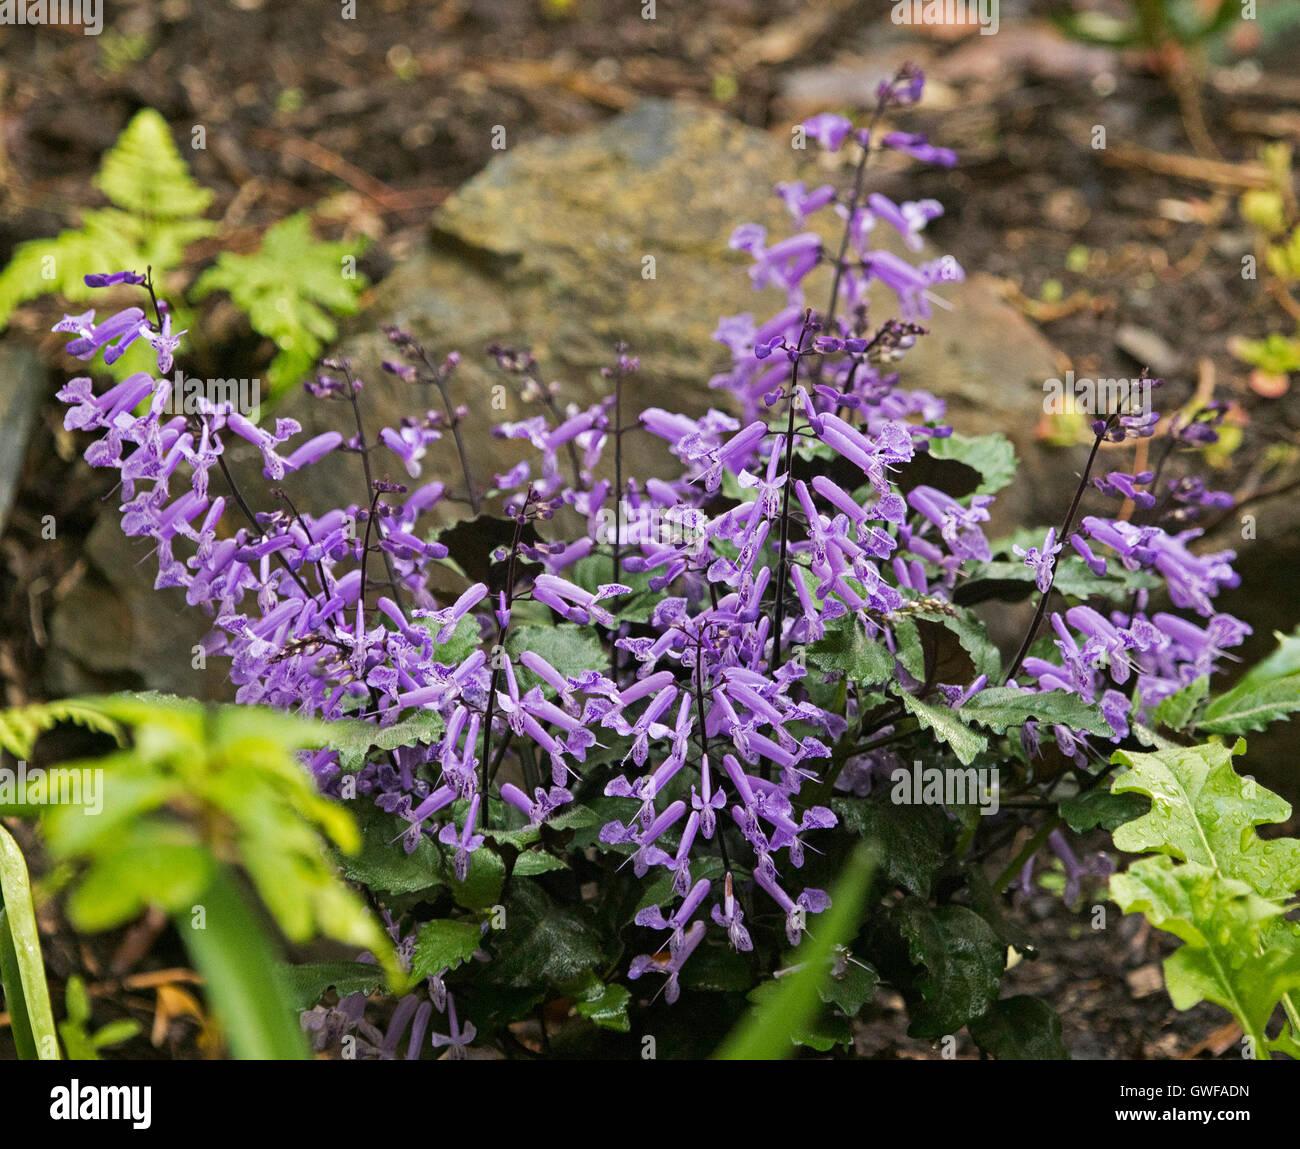 Cluster Of Spikes Of Bright Purple Flowers Dark Green Leaves Of